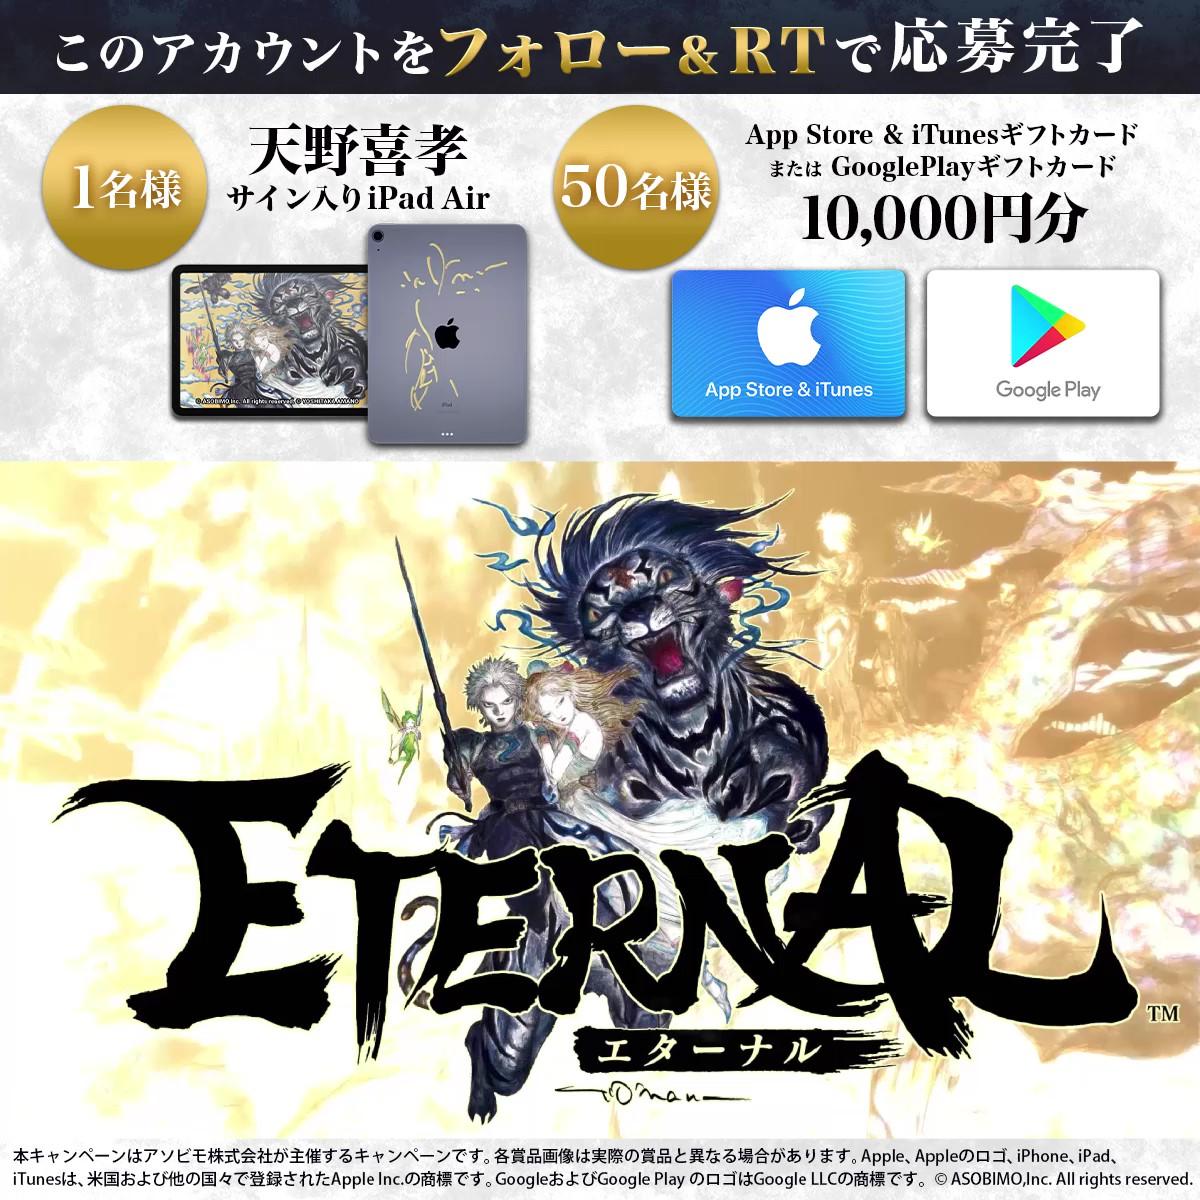 『ETERNAL』で50万DL突破記念キャンペーンが開催中!